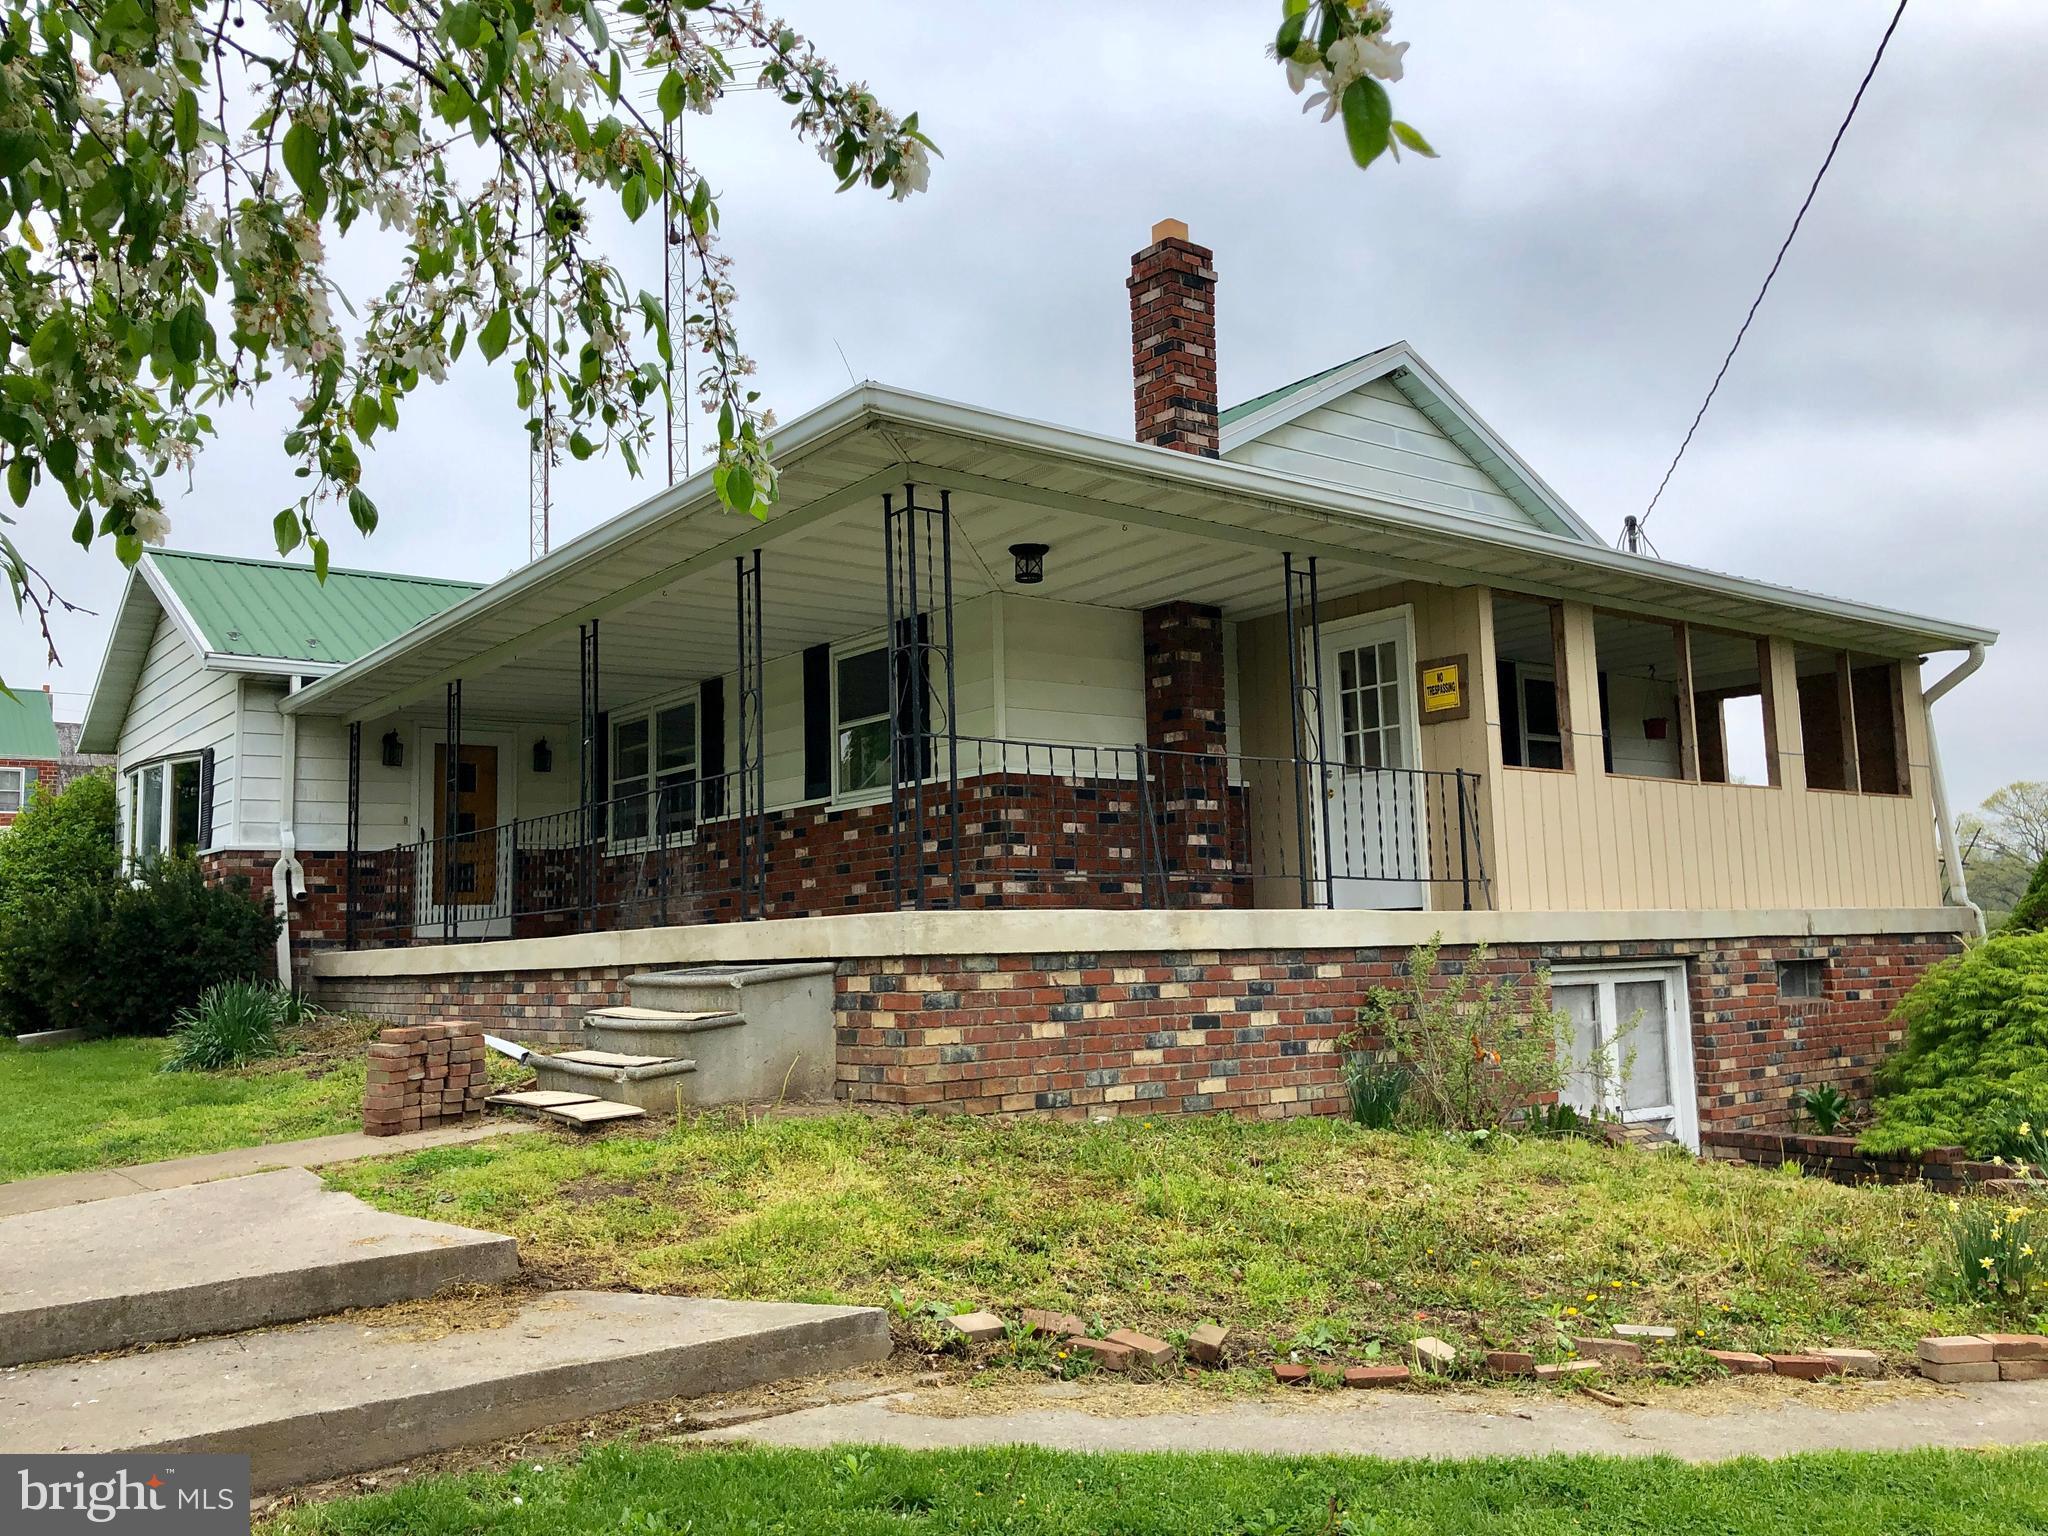 8890 THOMPSON ROAD, NEEDMORE, PA 17238